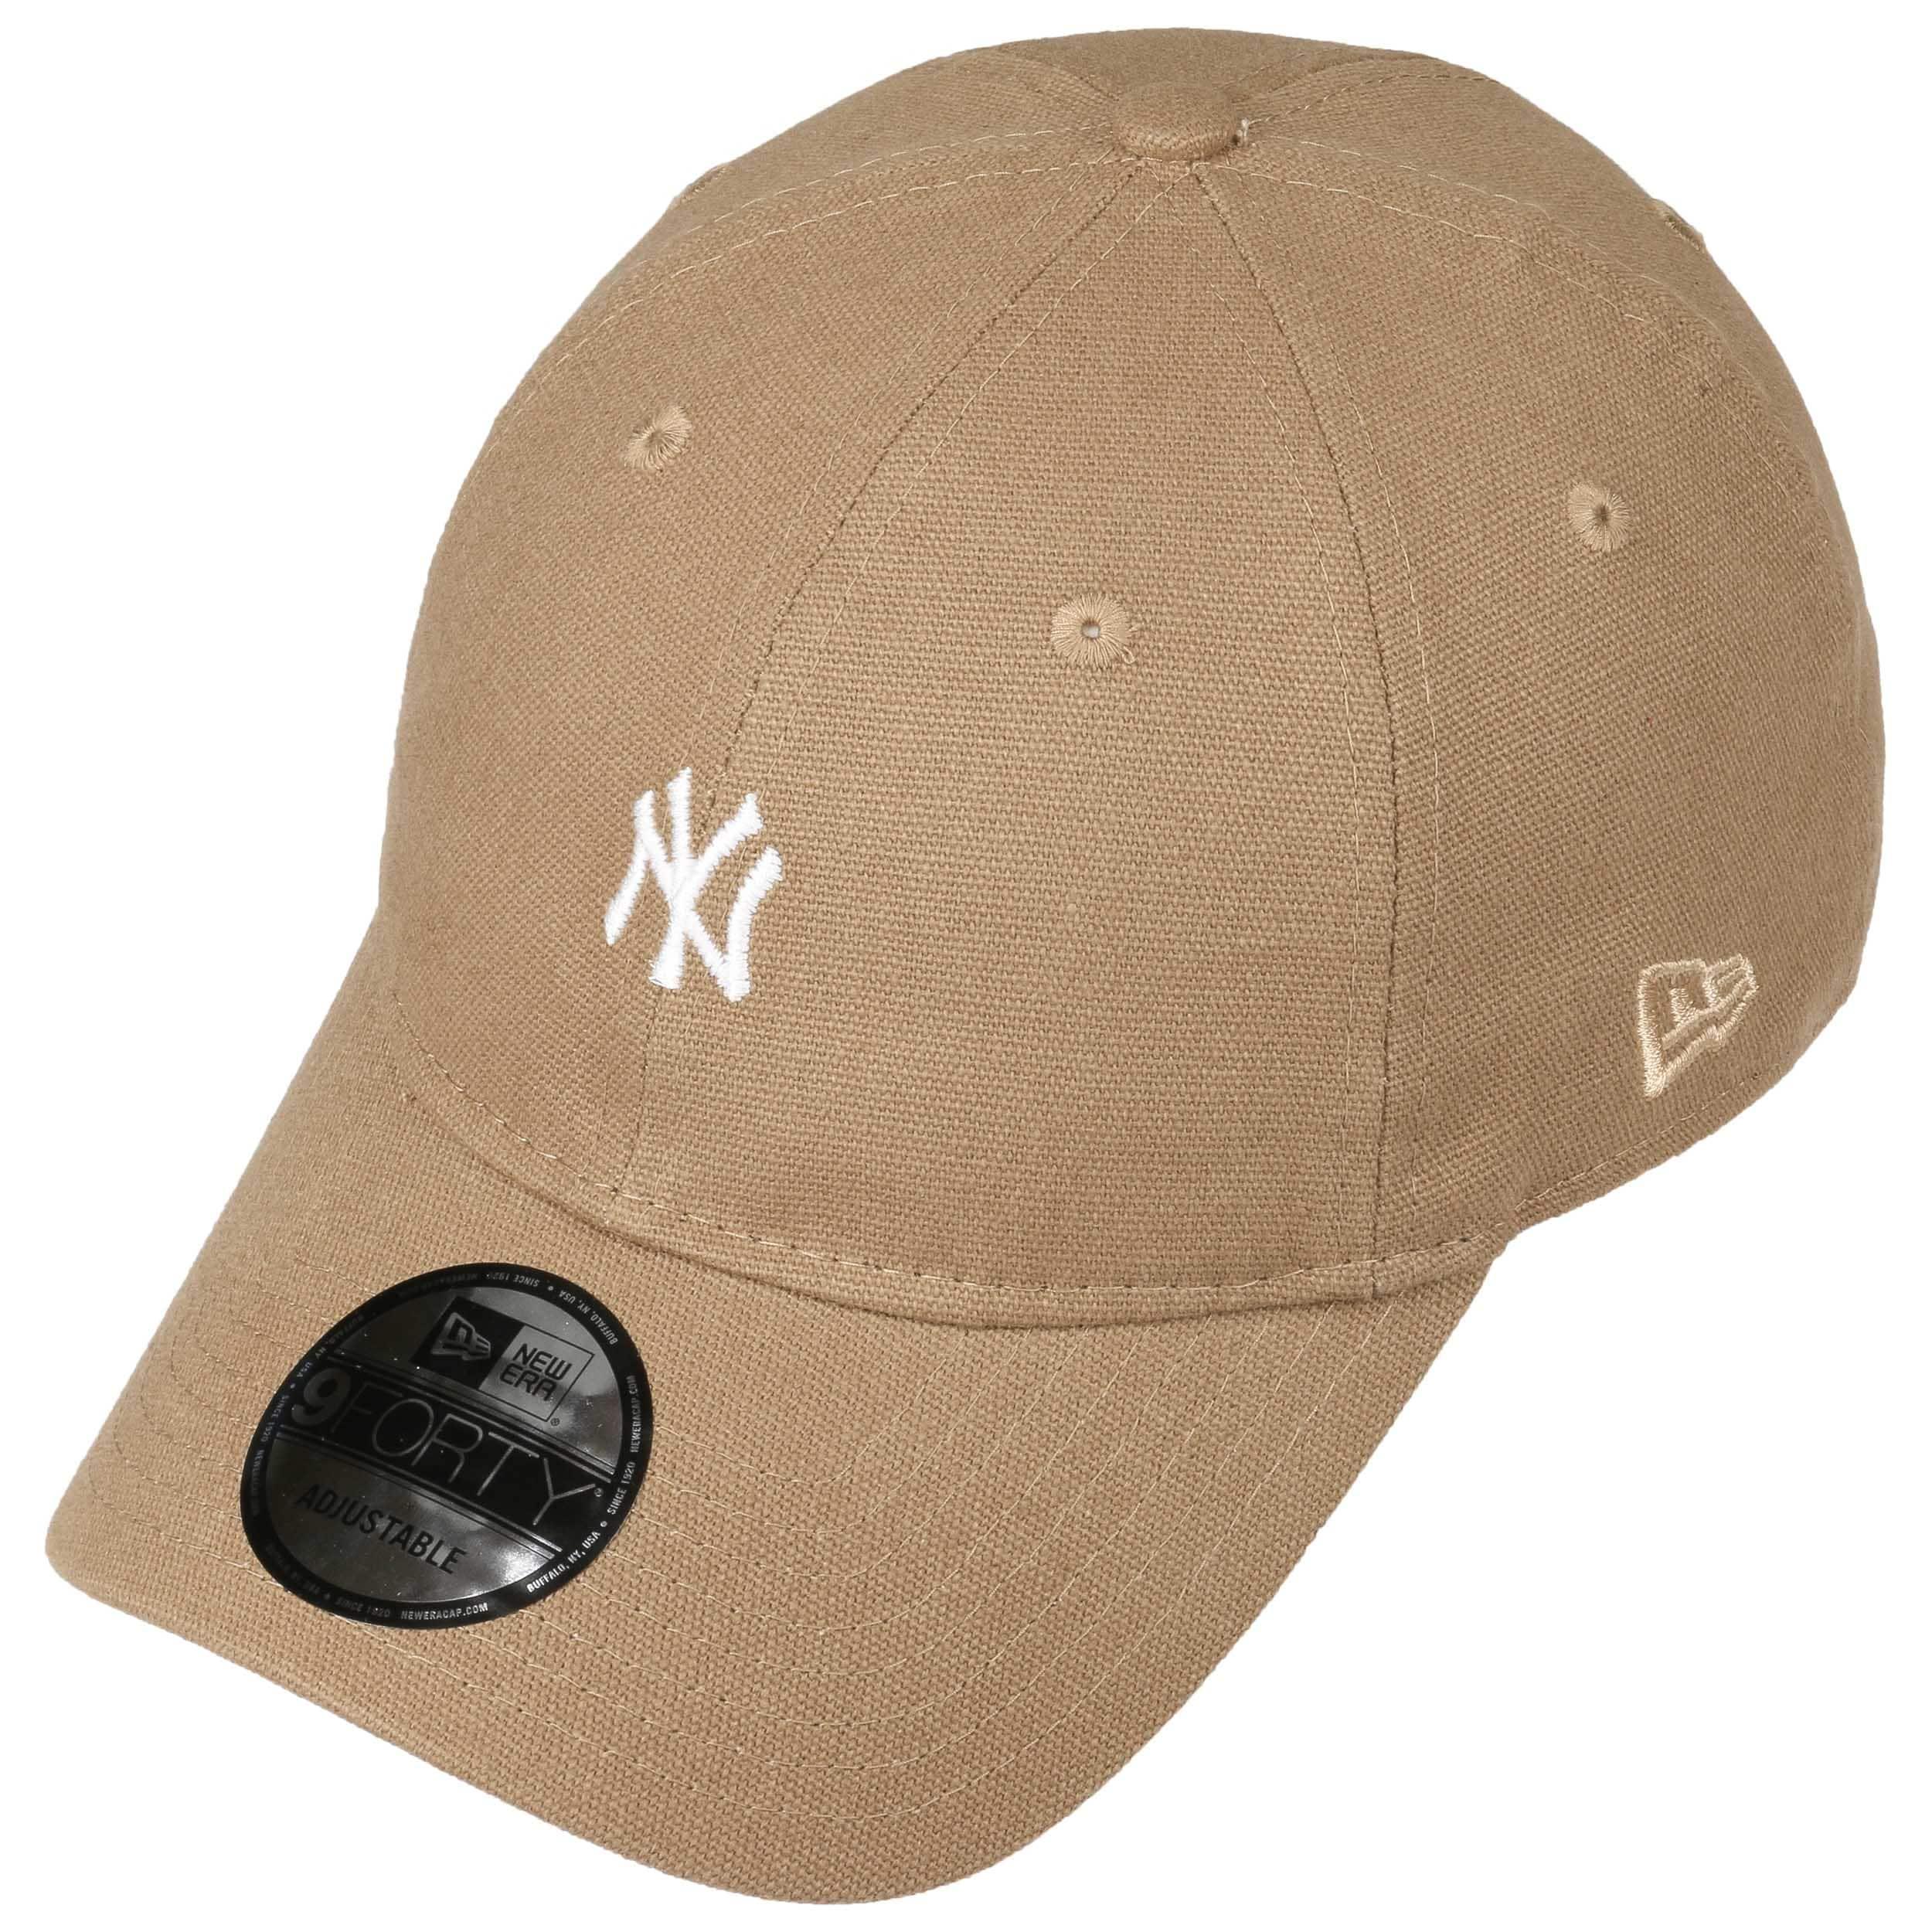 e229ca4c2e0 9Forty Canvas Yankees Cap by New Era - beige 1 ...